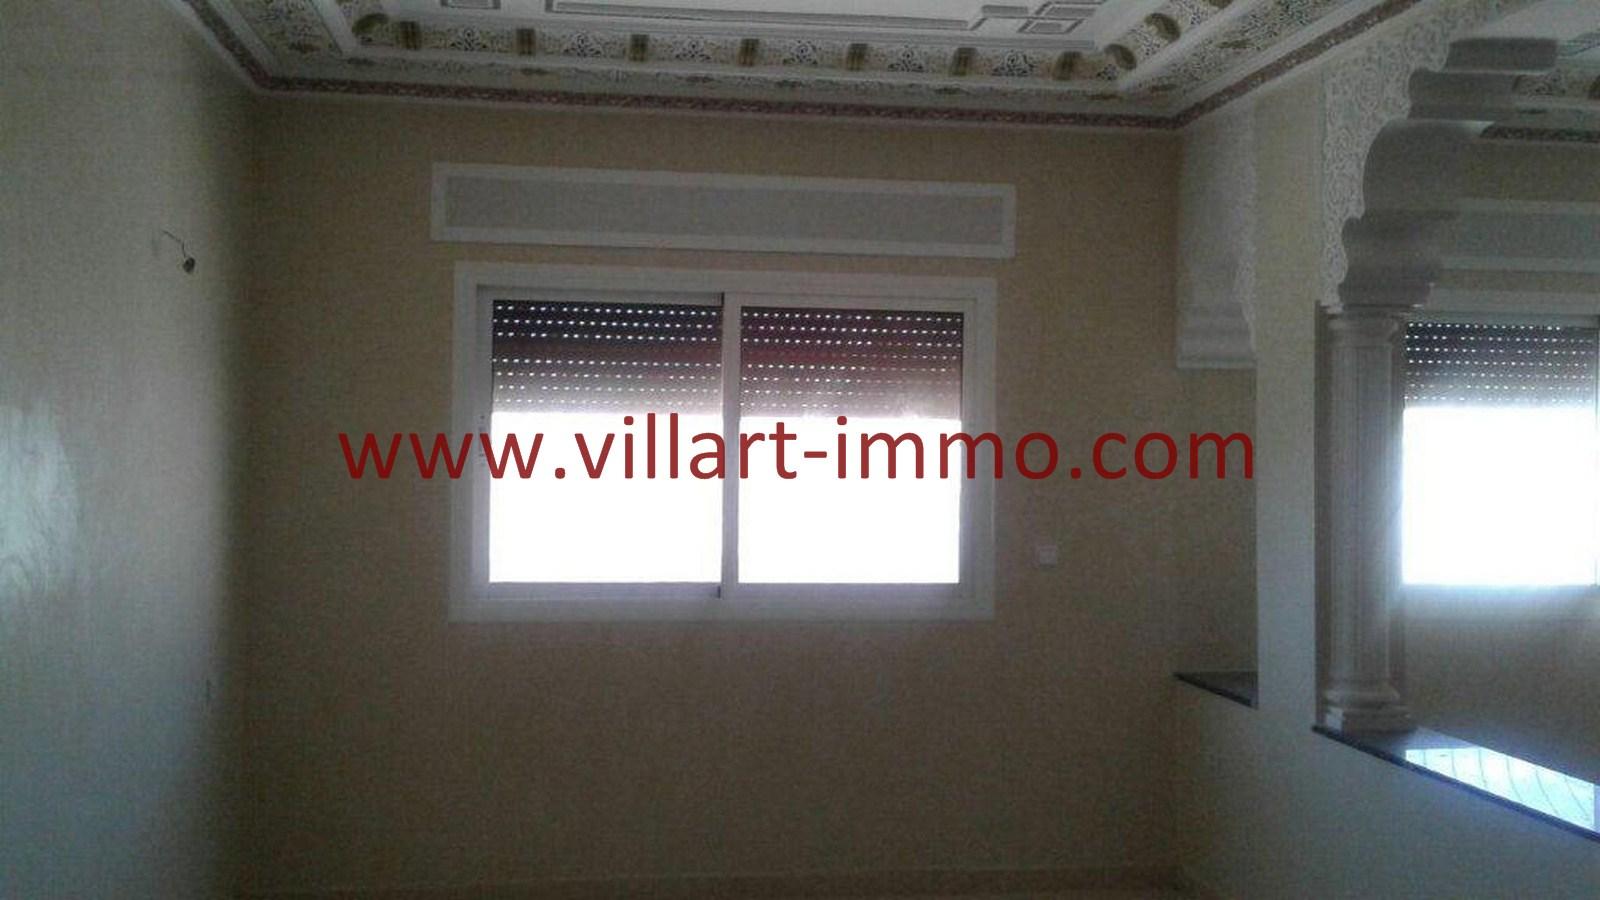 2-Vente-Maison-Tanger-Mojahidine -Salon 2-VM500-Villart Immo